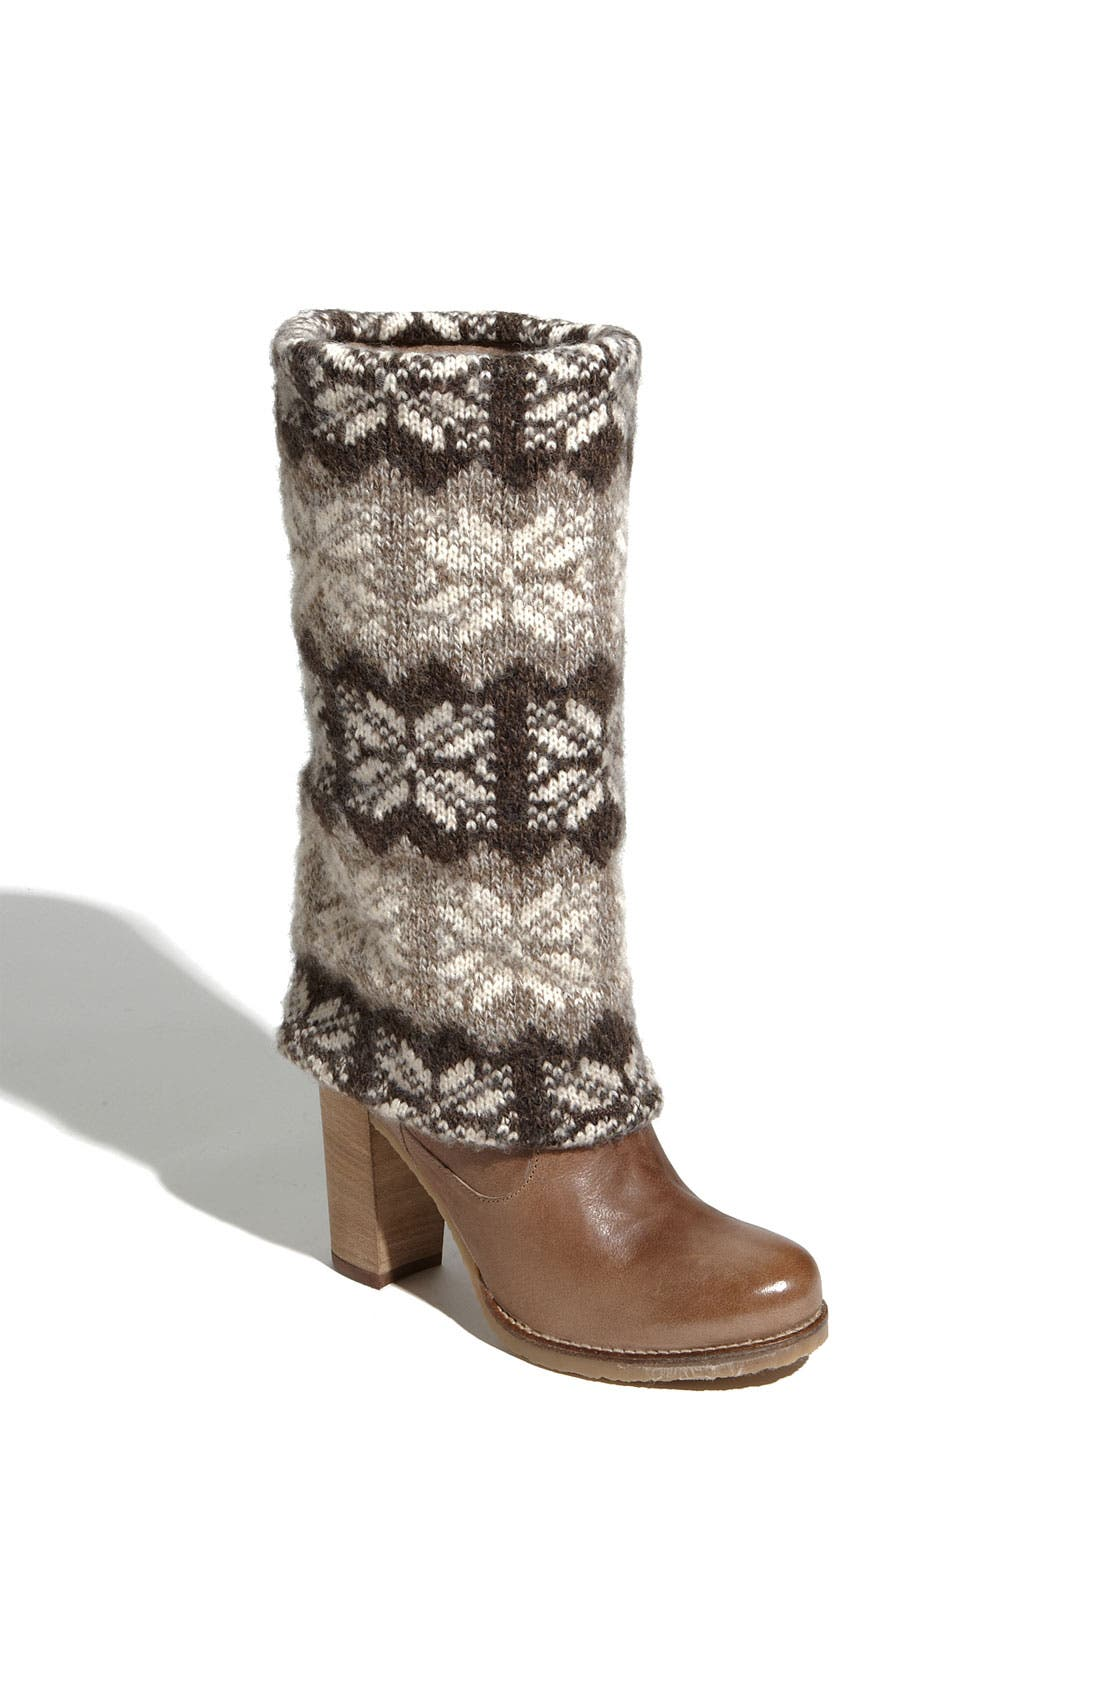 Alternate Image 1 Selected - Paola Ferri '7153' Boot